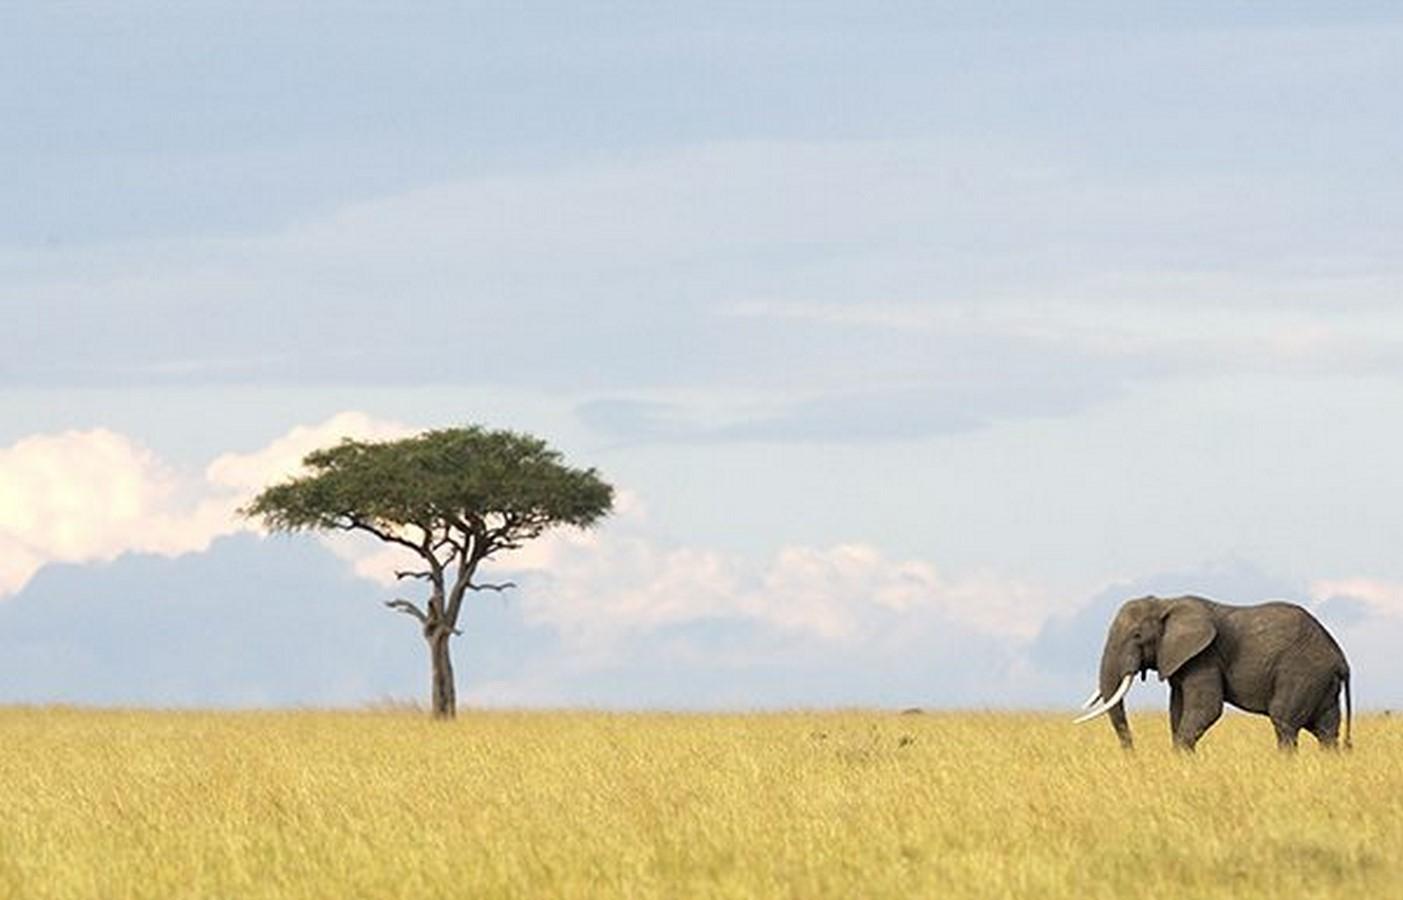 Serengeti National Park, Tanzania. - Sheet1